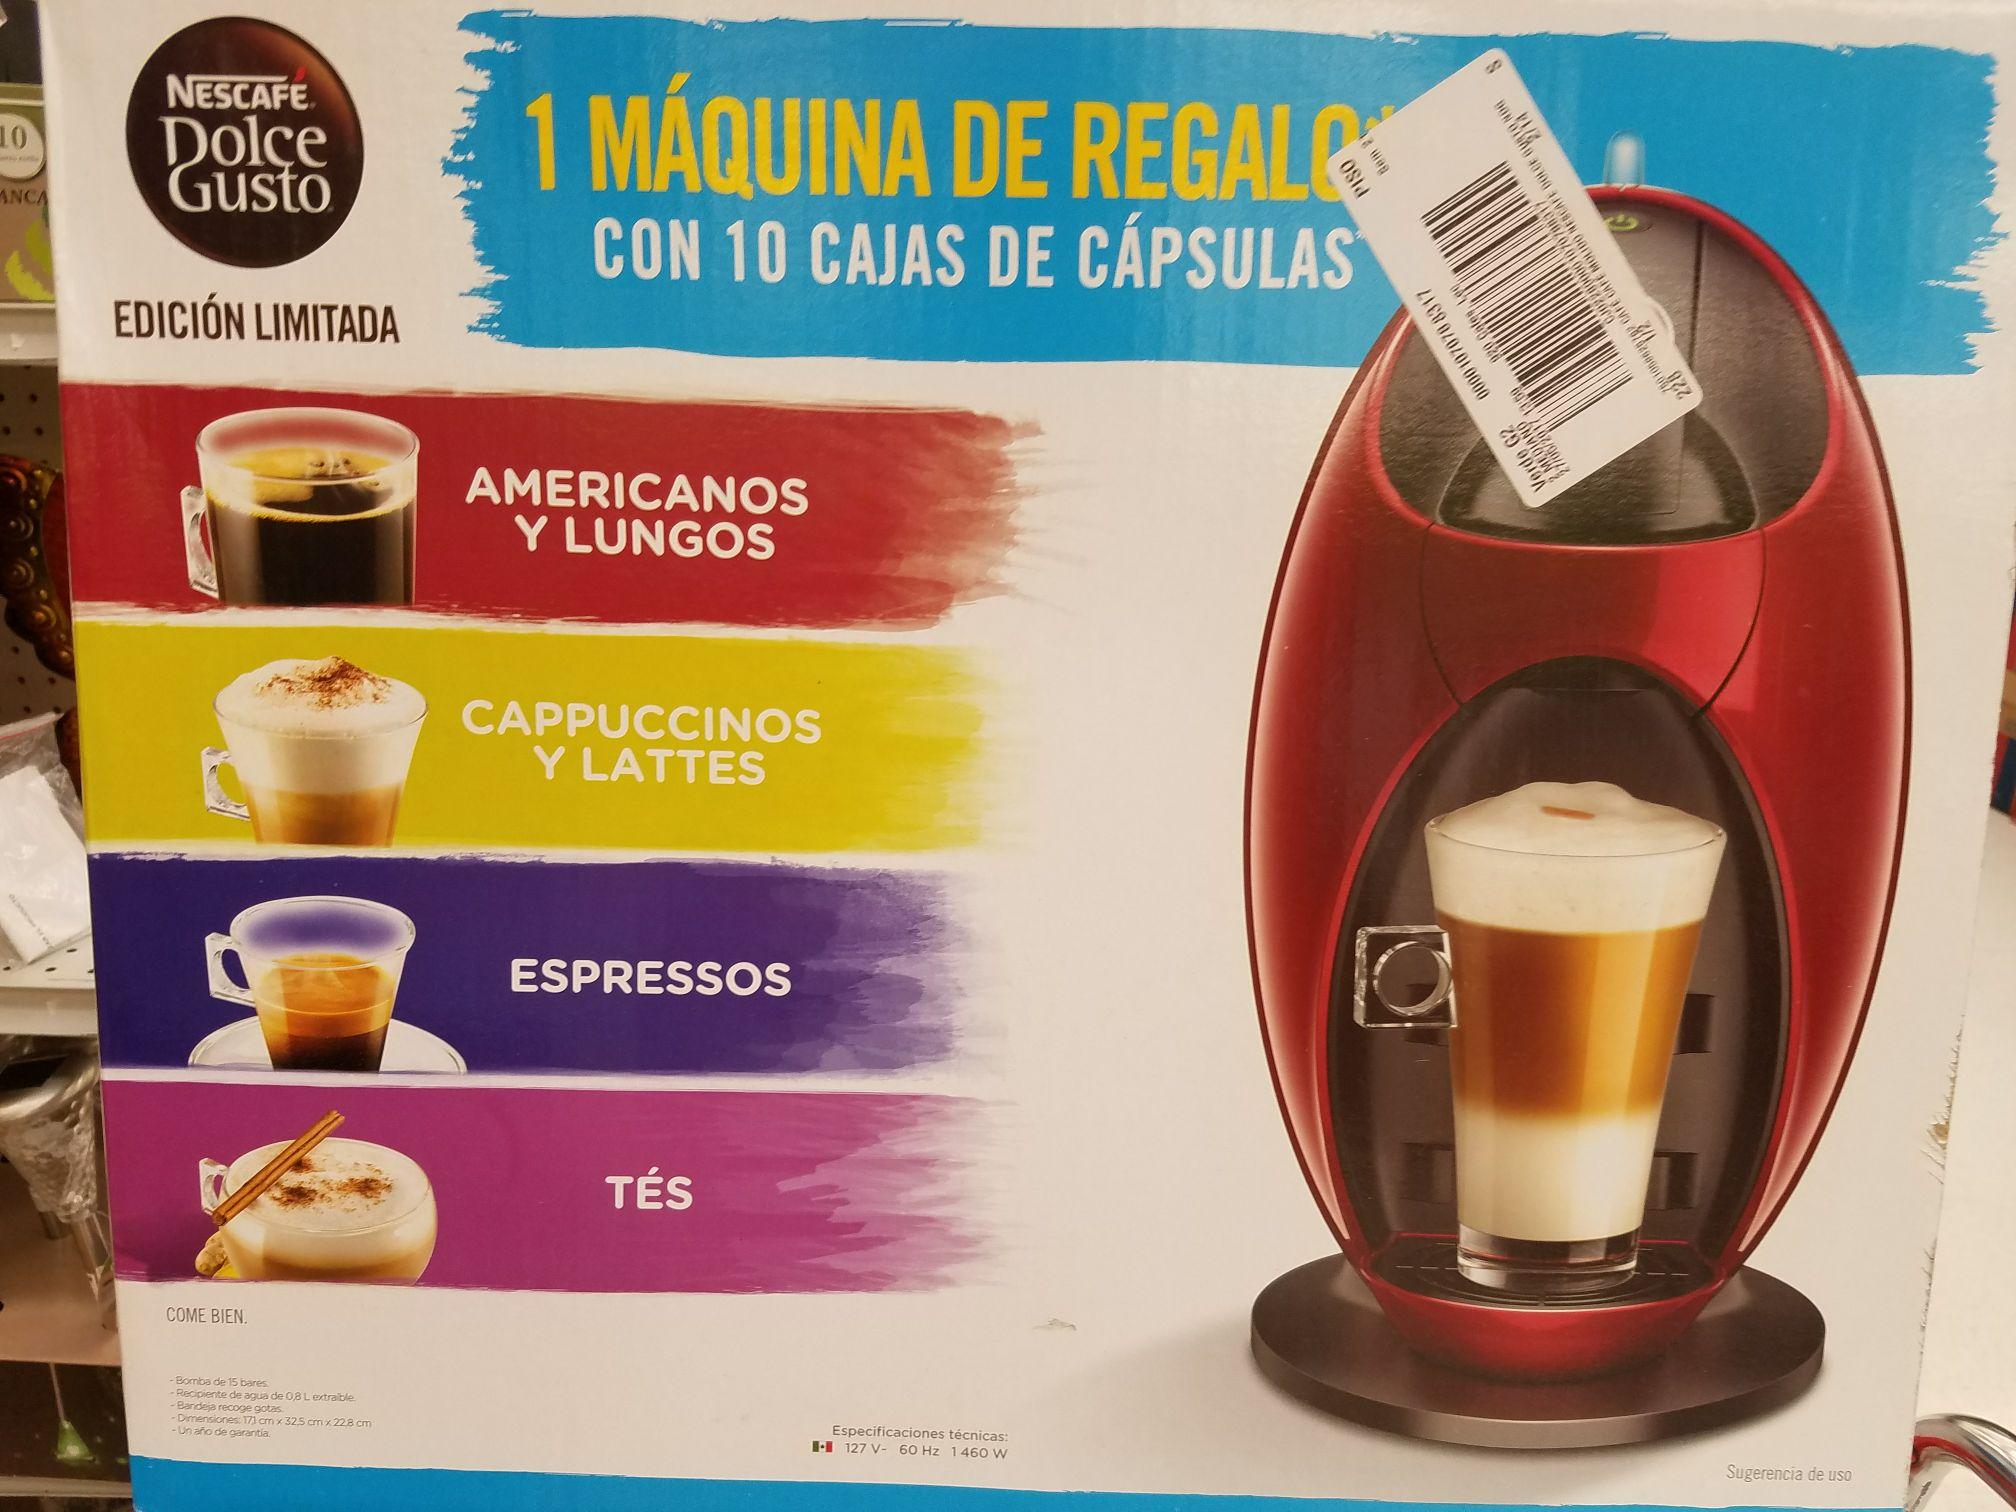 Soriana: Café Dolce Gusto 10 cajas con 16 cápsulas c/u a 998 pesos incluye máquina de regalo.. Aplica 3x2 quedando a 665 c/u